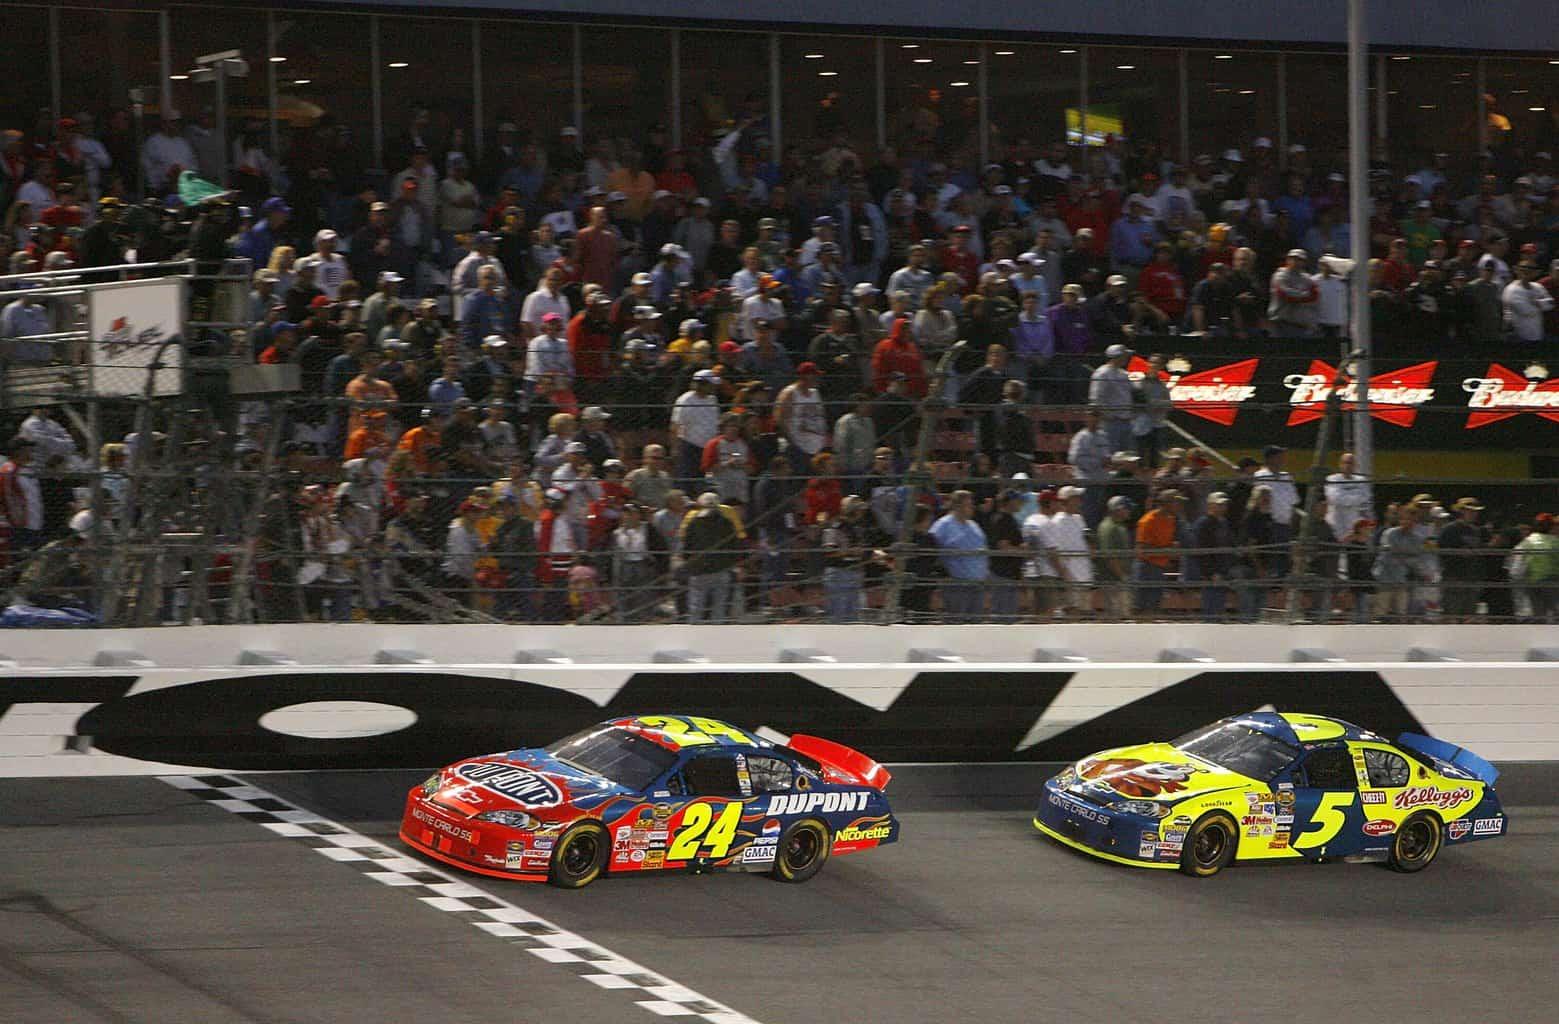 Jeff Gordon and Kyle Busch On Track Duel Daytona 2006